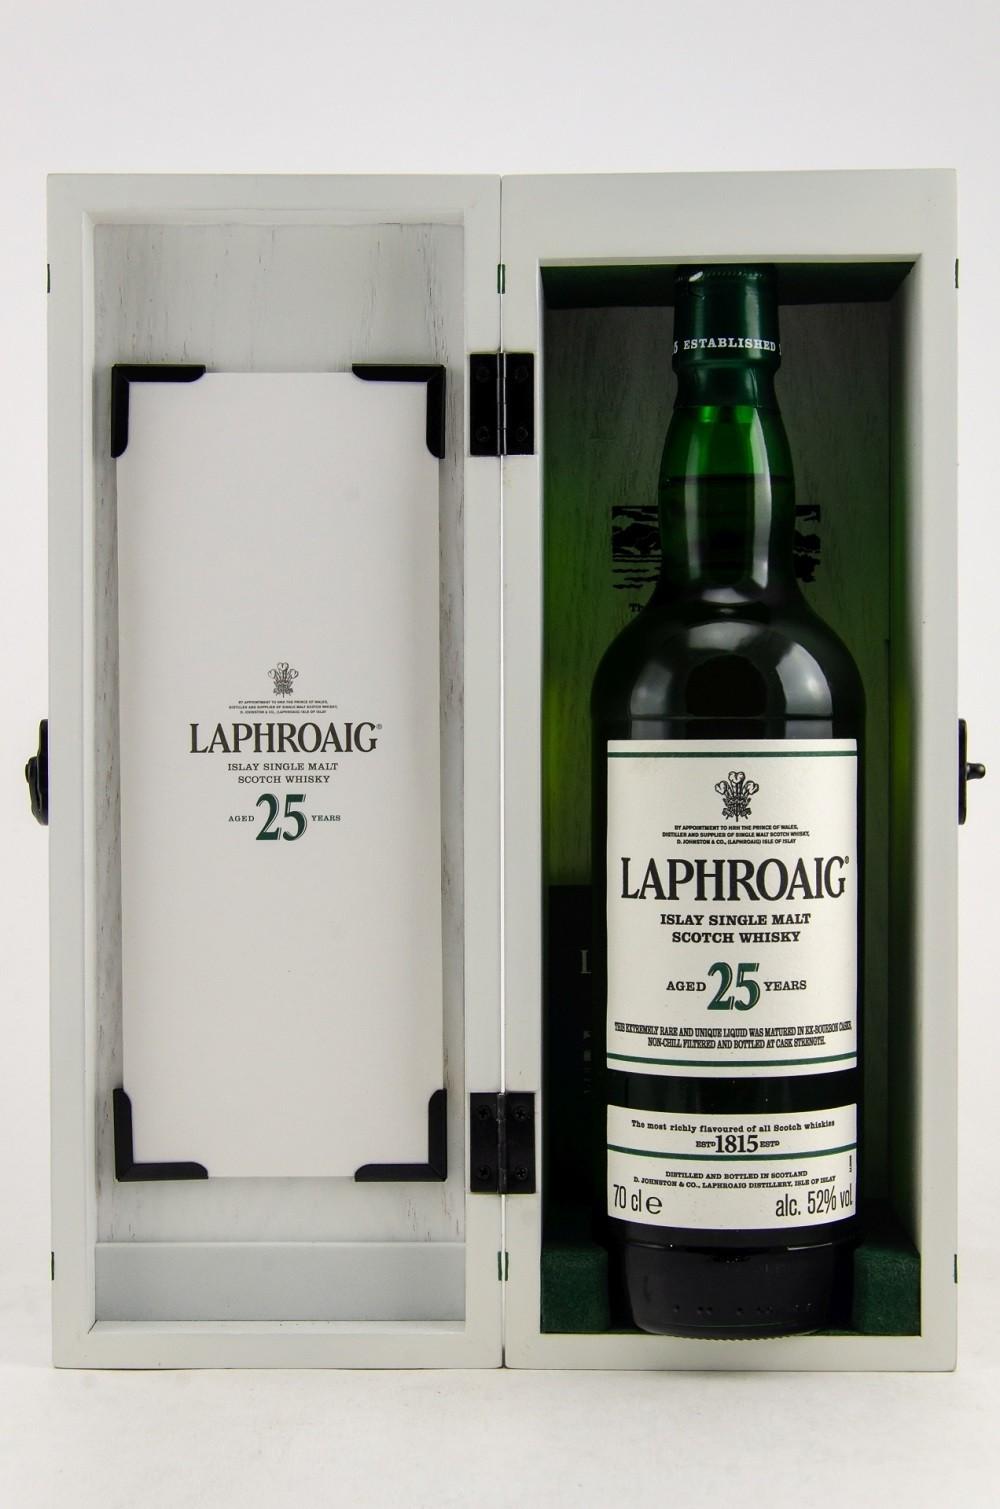 Laphroaig 25 y.o. Cask Strength 52% (2018)